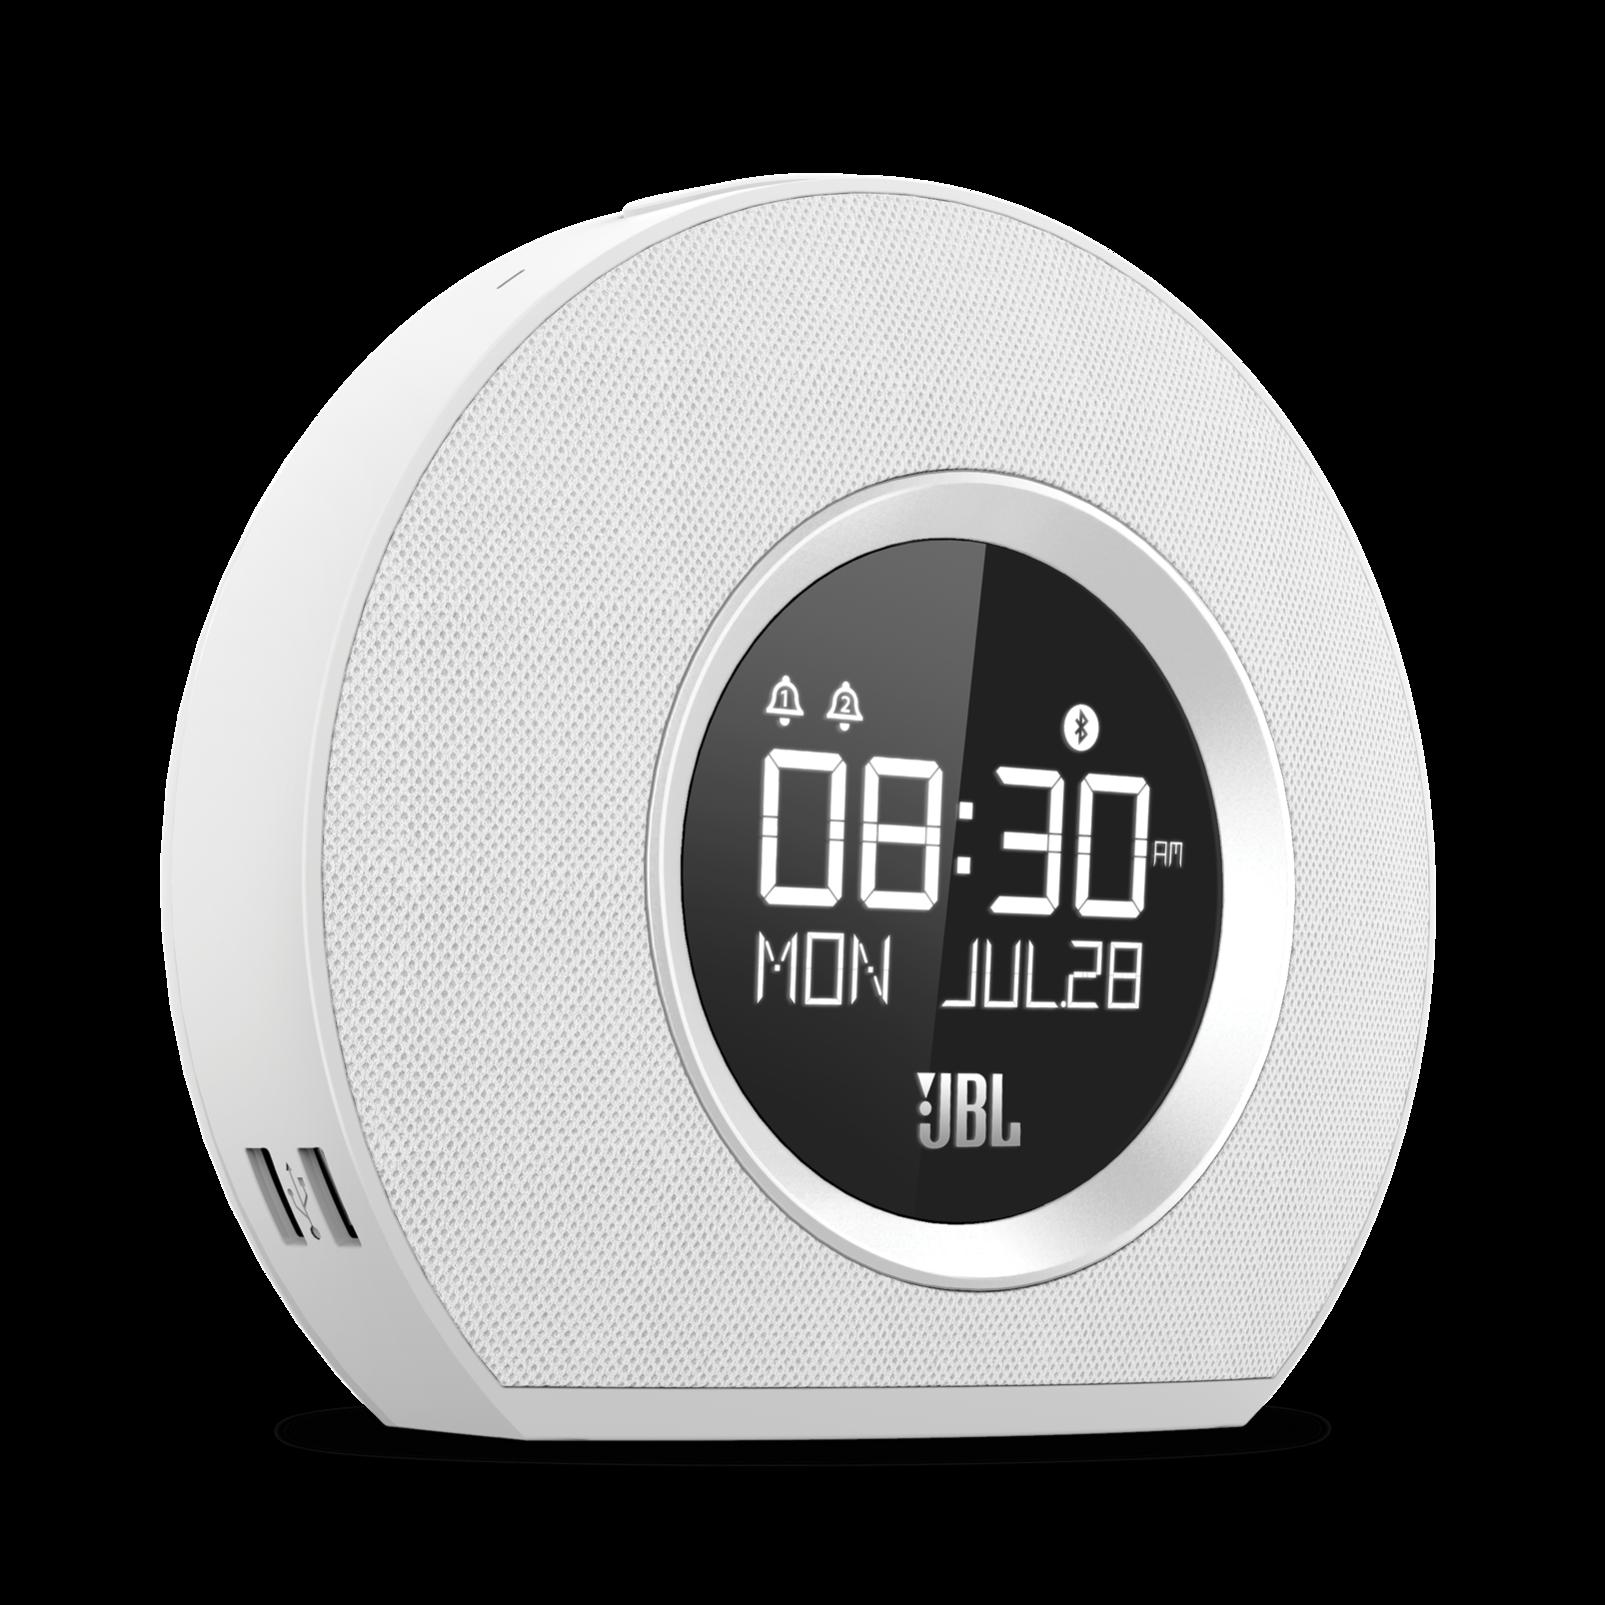 JBL Horizon - White - Bluetooth clock radio with USB charging and ambient light - Hero